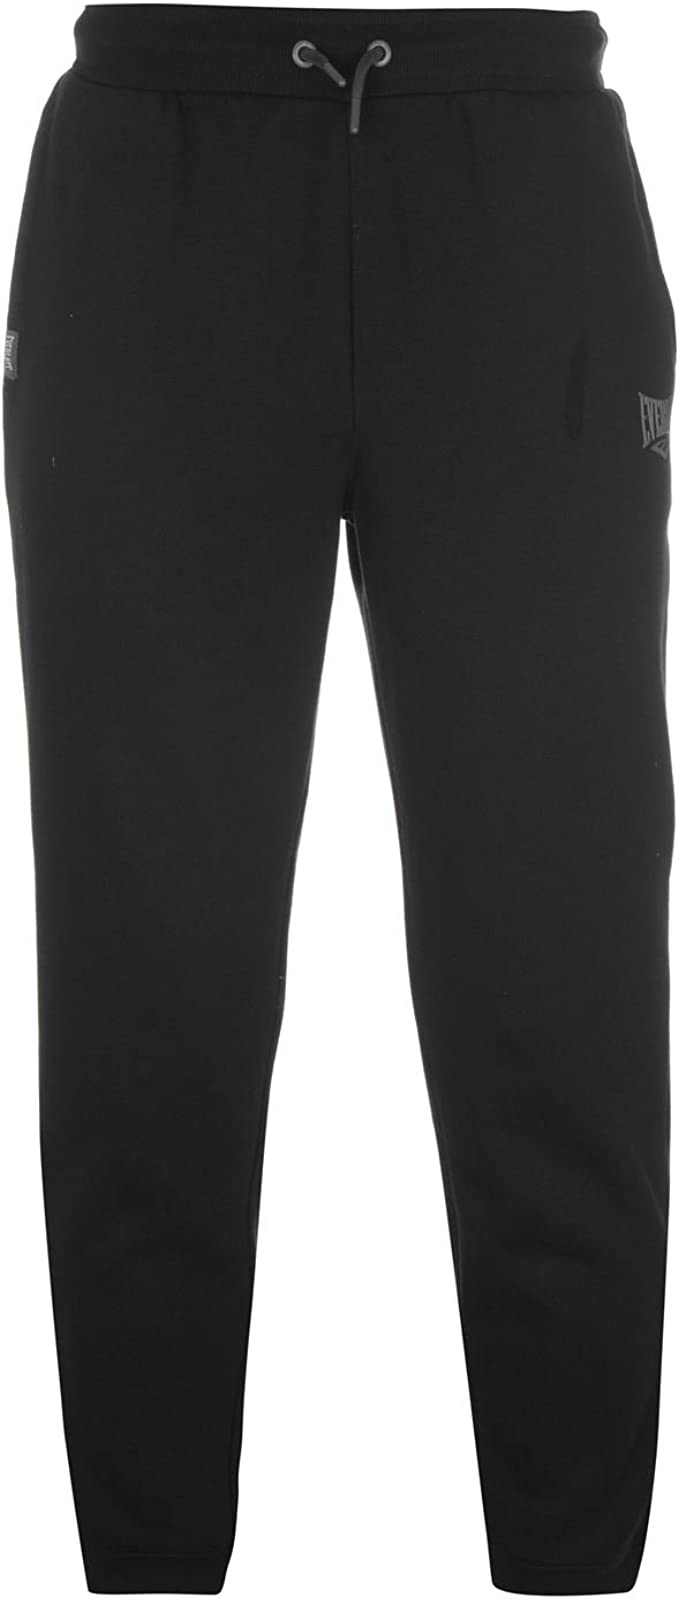 Everlast Mens Jogging Bottoms Fleece Trousers Pants Warm